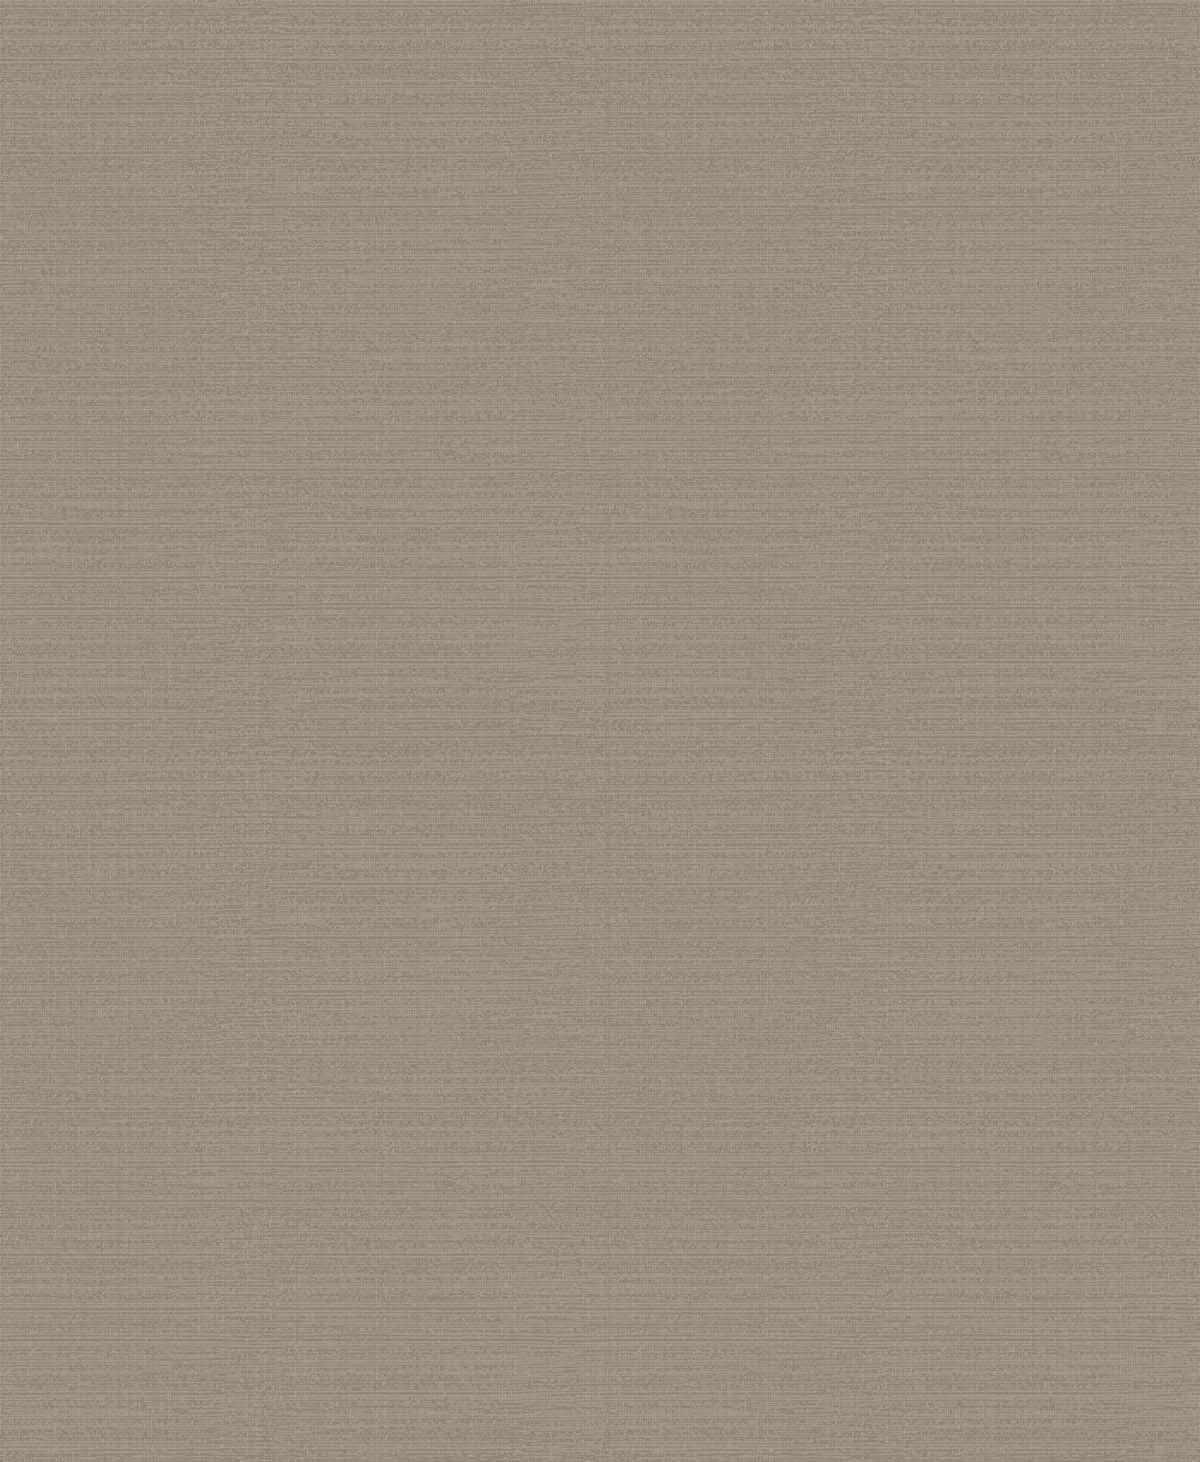 savile-row-wallpaper-melton-silk-SR00513